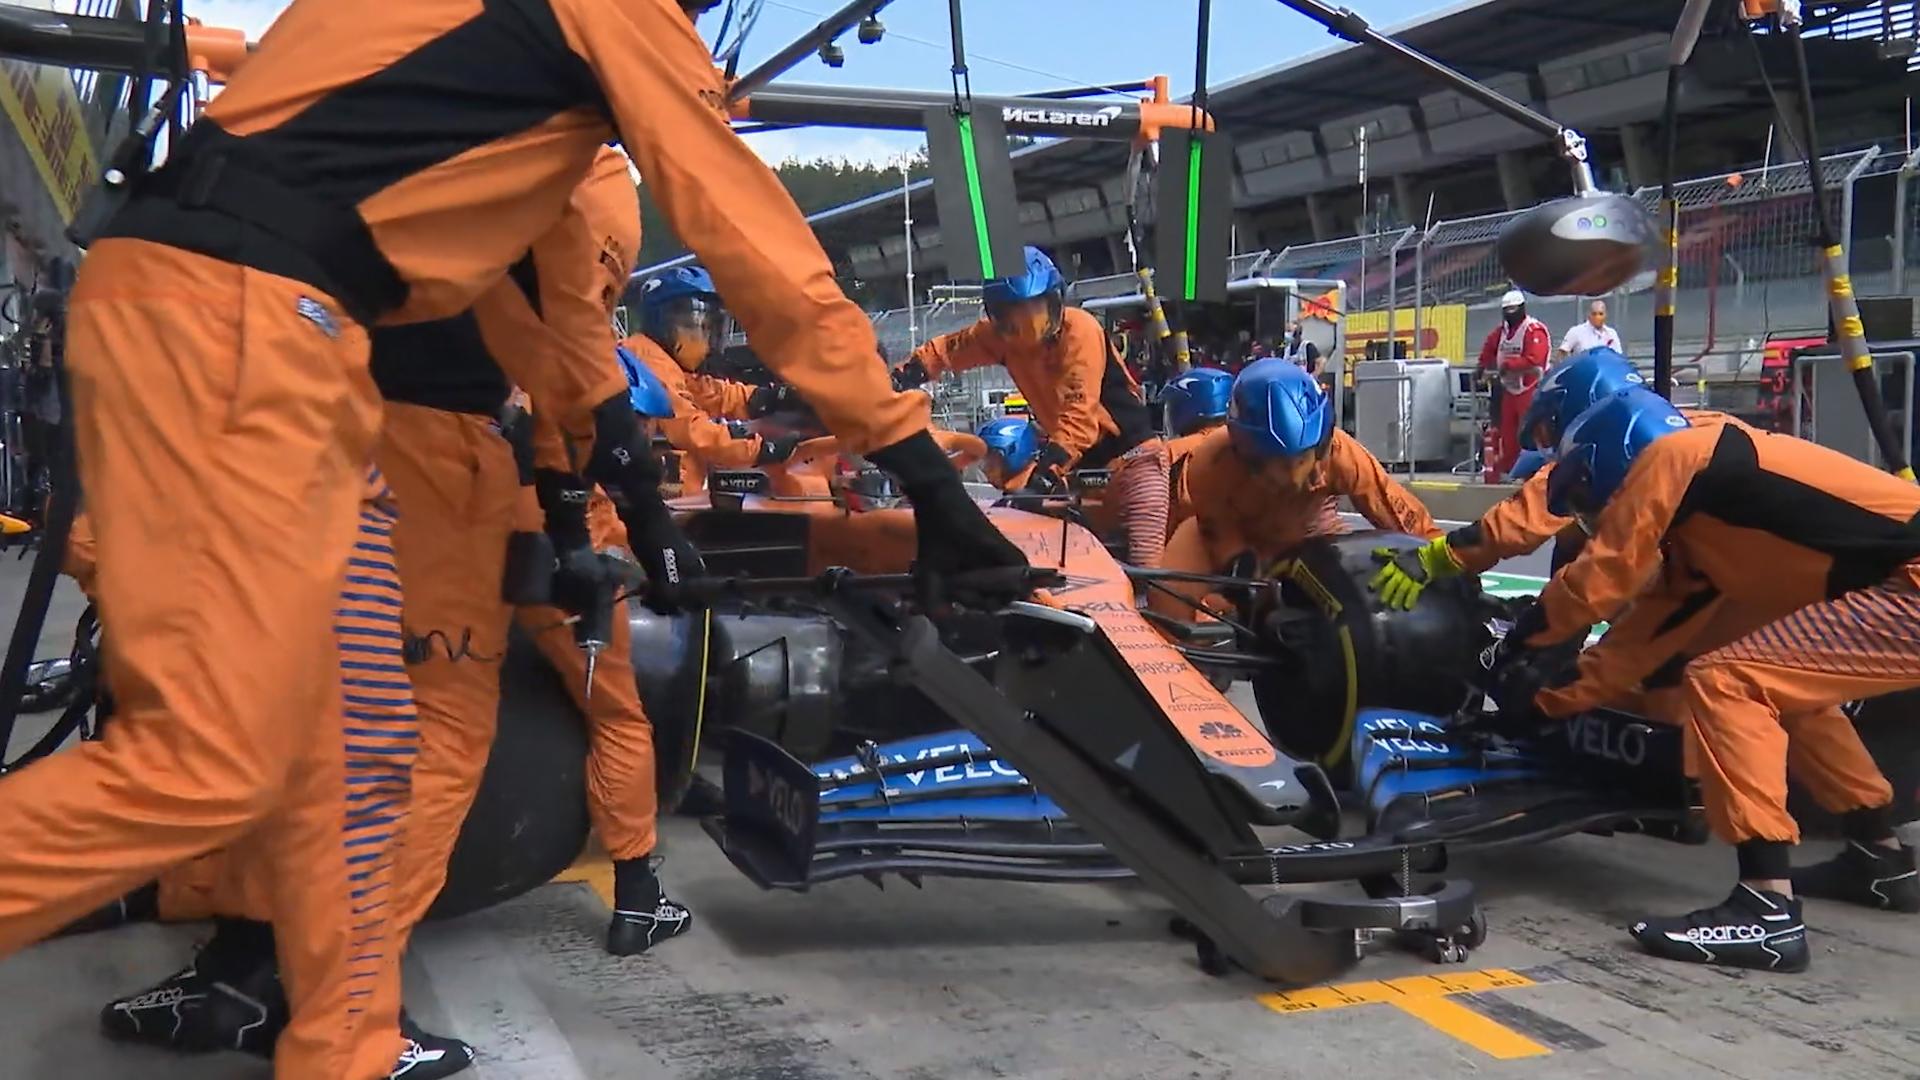 Styrian Grand Prix: Slow pit stop costs Carlos Sainz